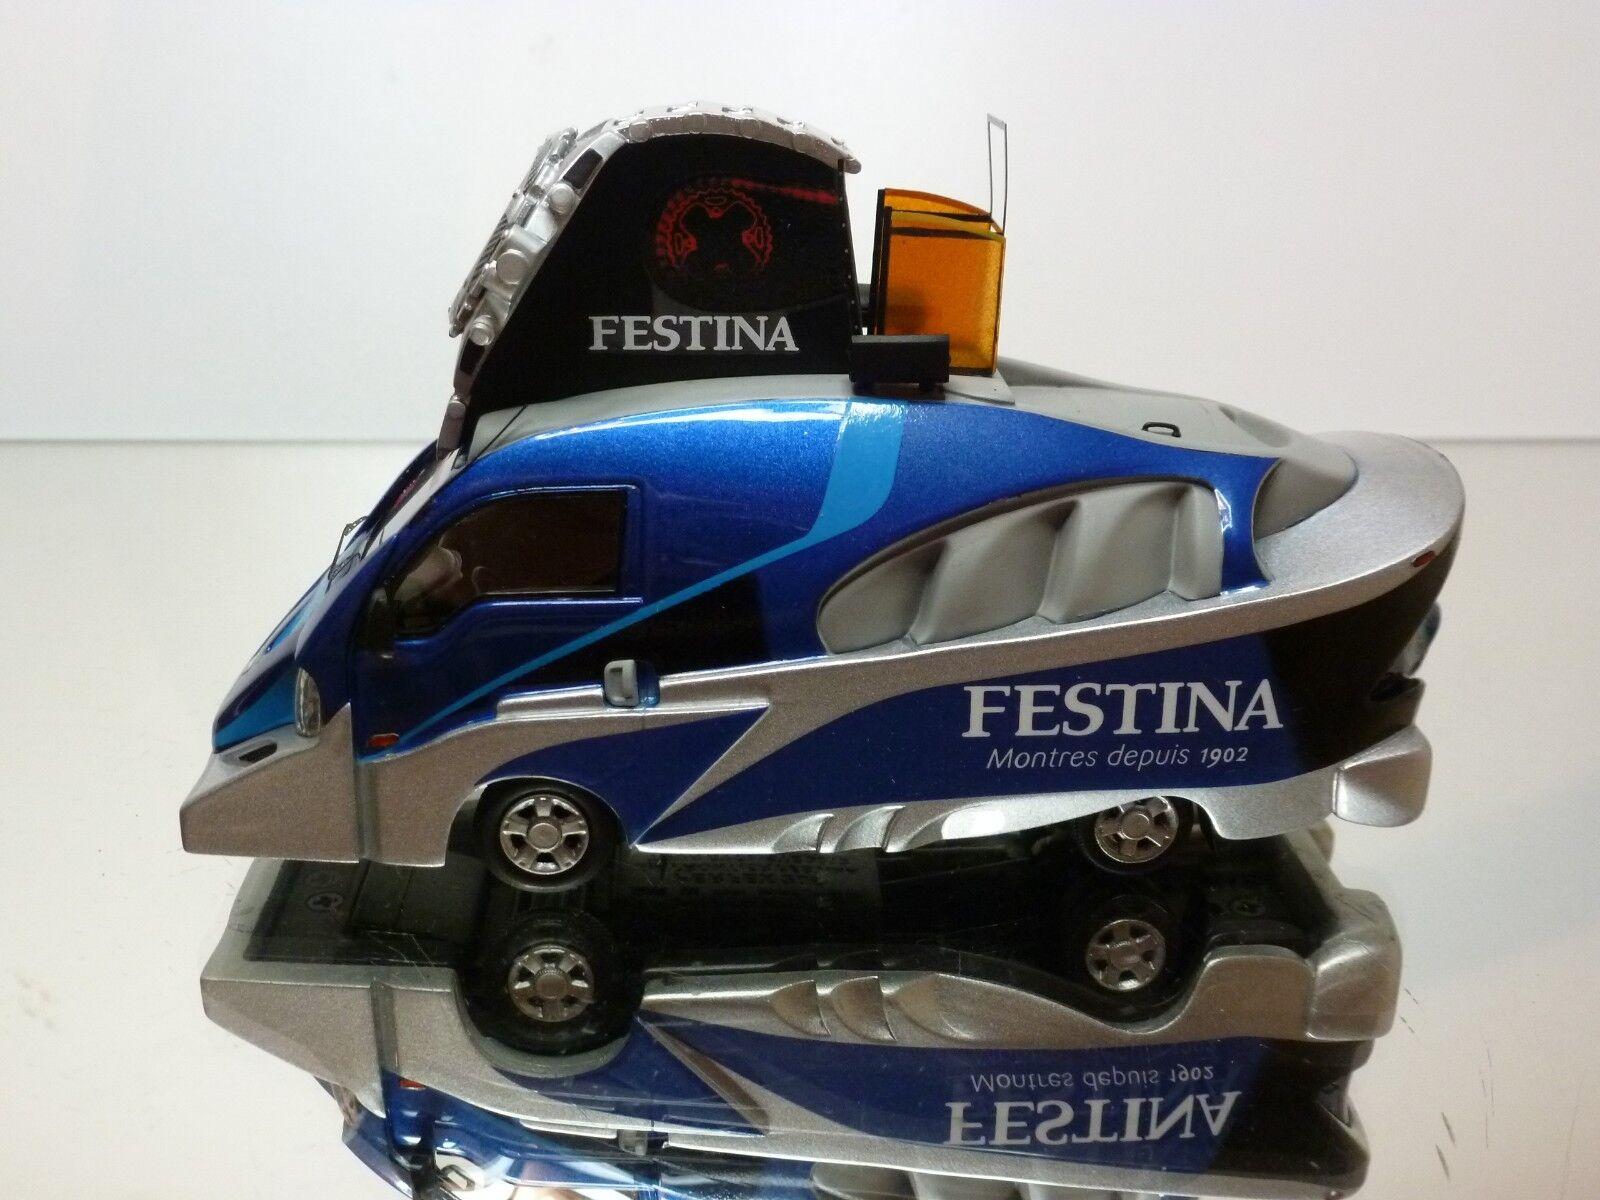 PERFEX 205 KIA FRONTIER FESTINA TOUR CYCLISTE 2012 2012 2012 - blueE 1 43  - EXCELLENT- 39 678de0